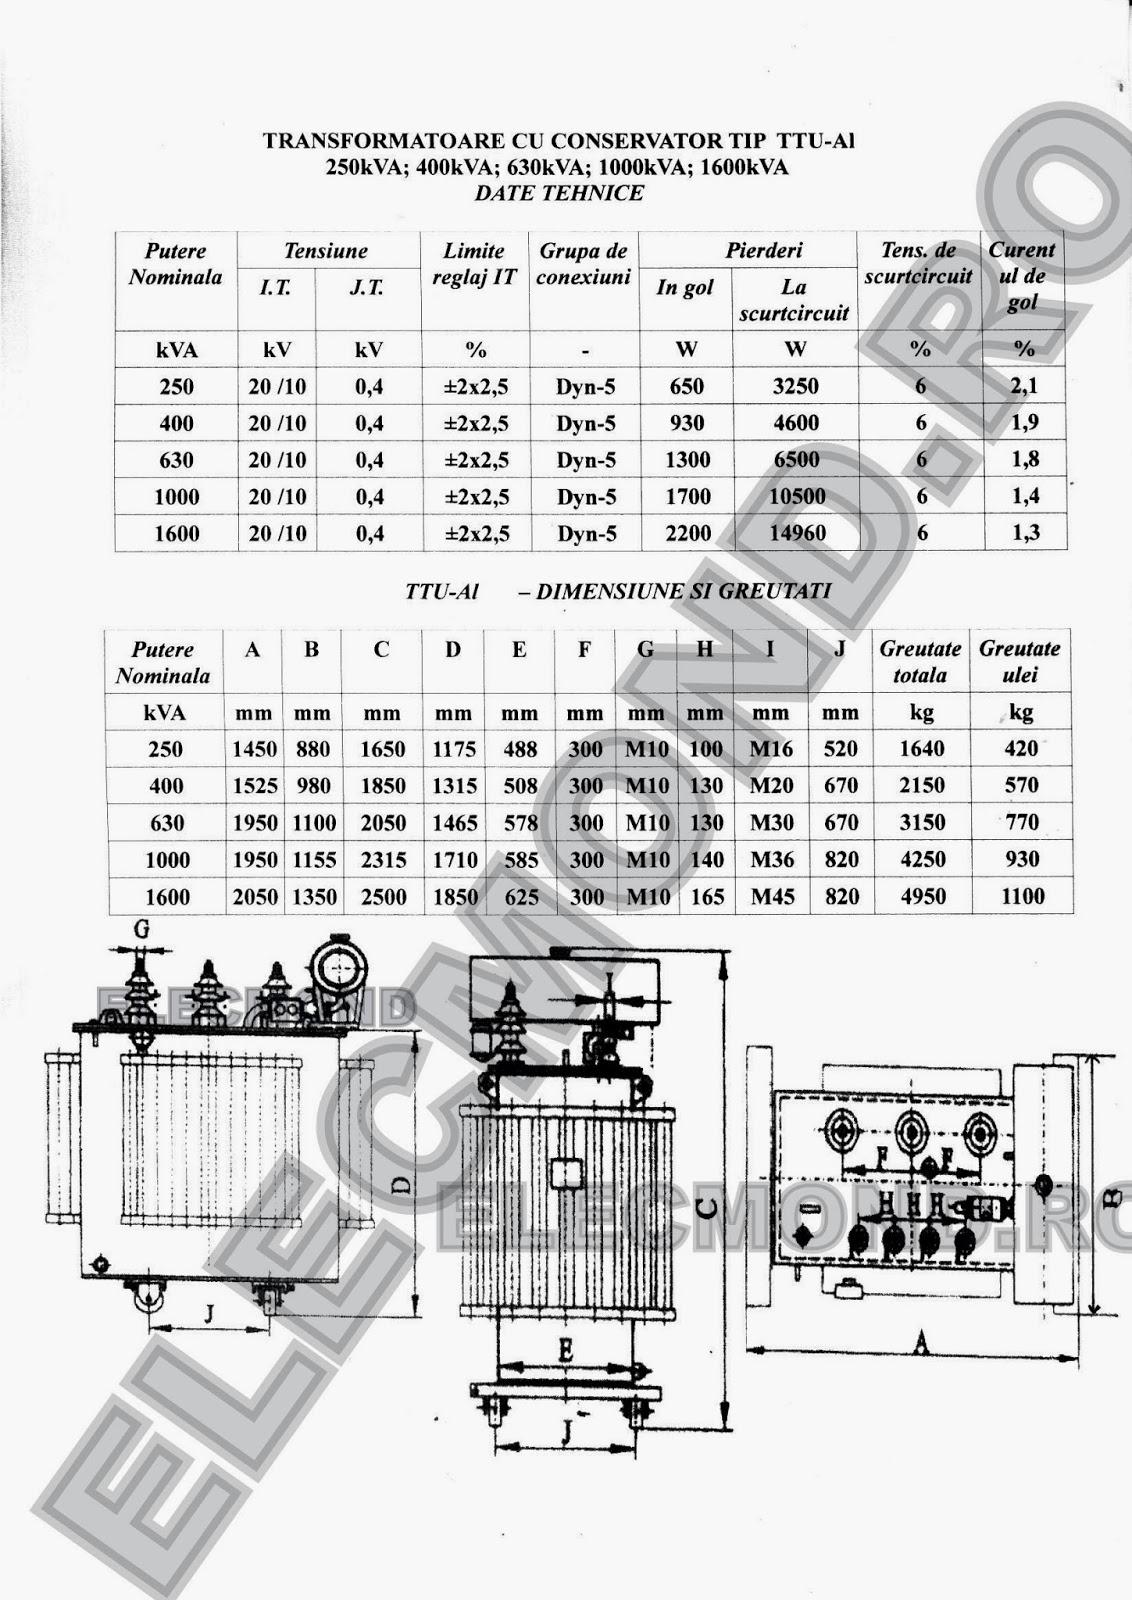 DATE TEHNICE TRANSFORMATOARE CU CONSERVATOR ALUMINIU 250 kVA 400 kVA 630 kVA 1000 kVA 1600 kVA